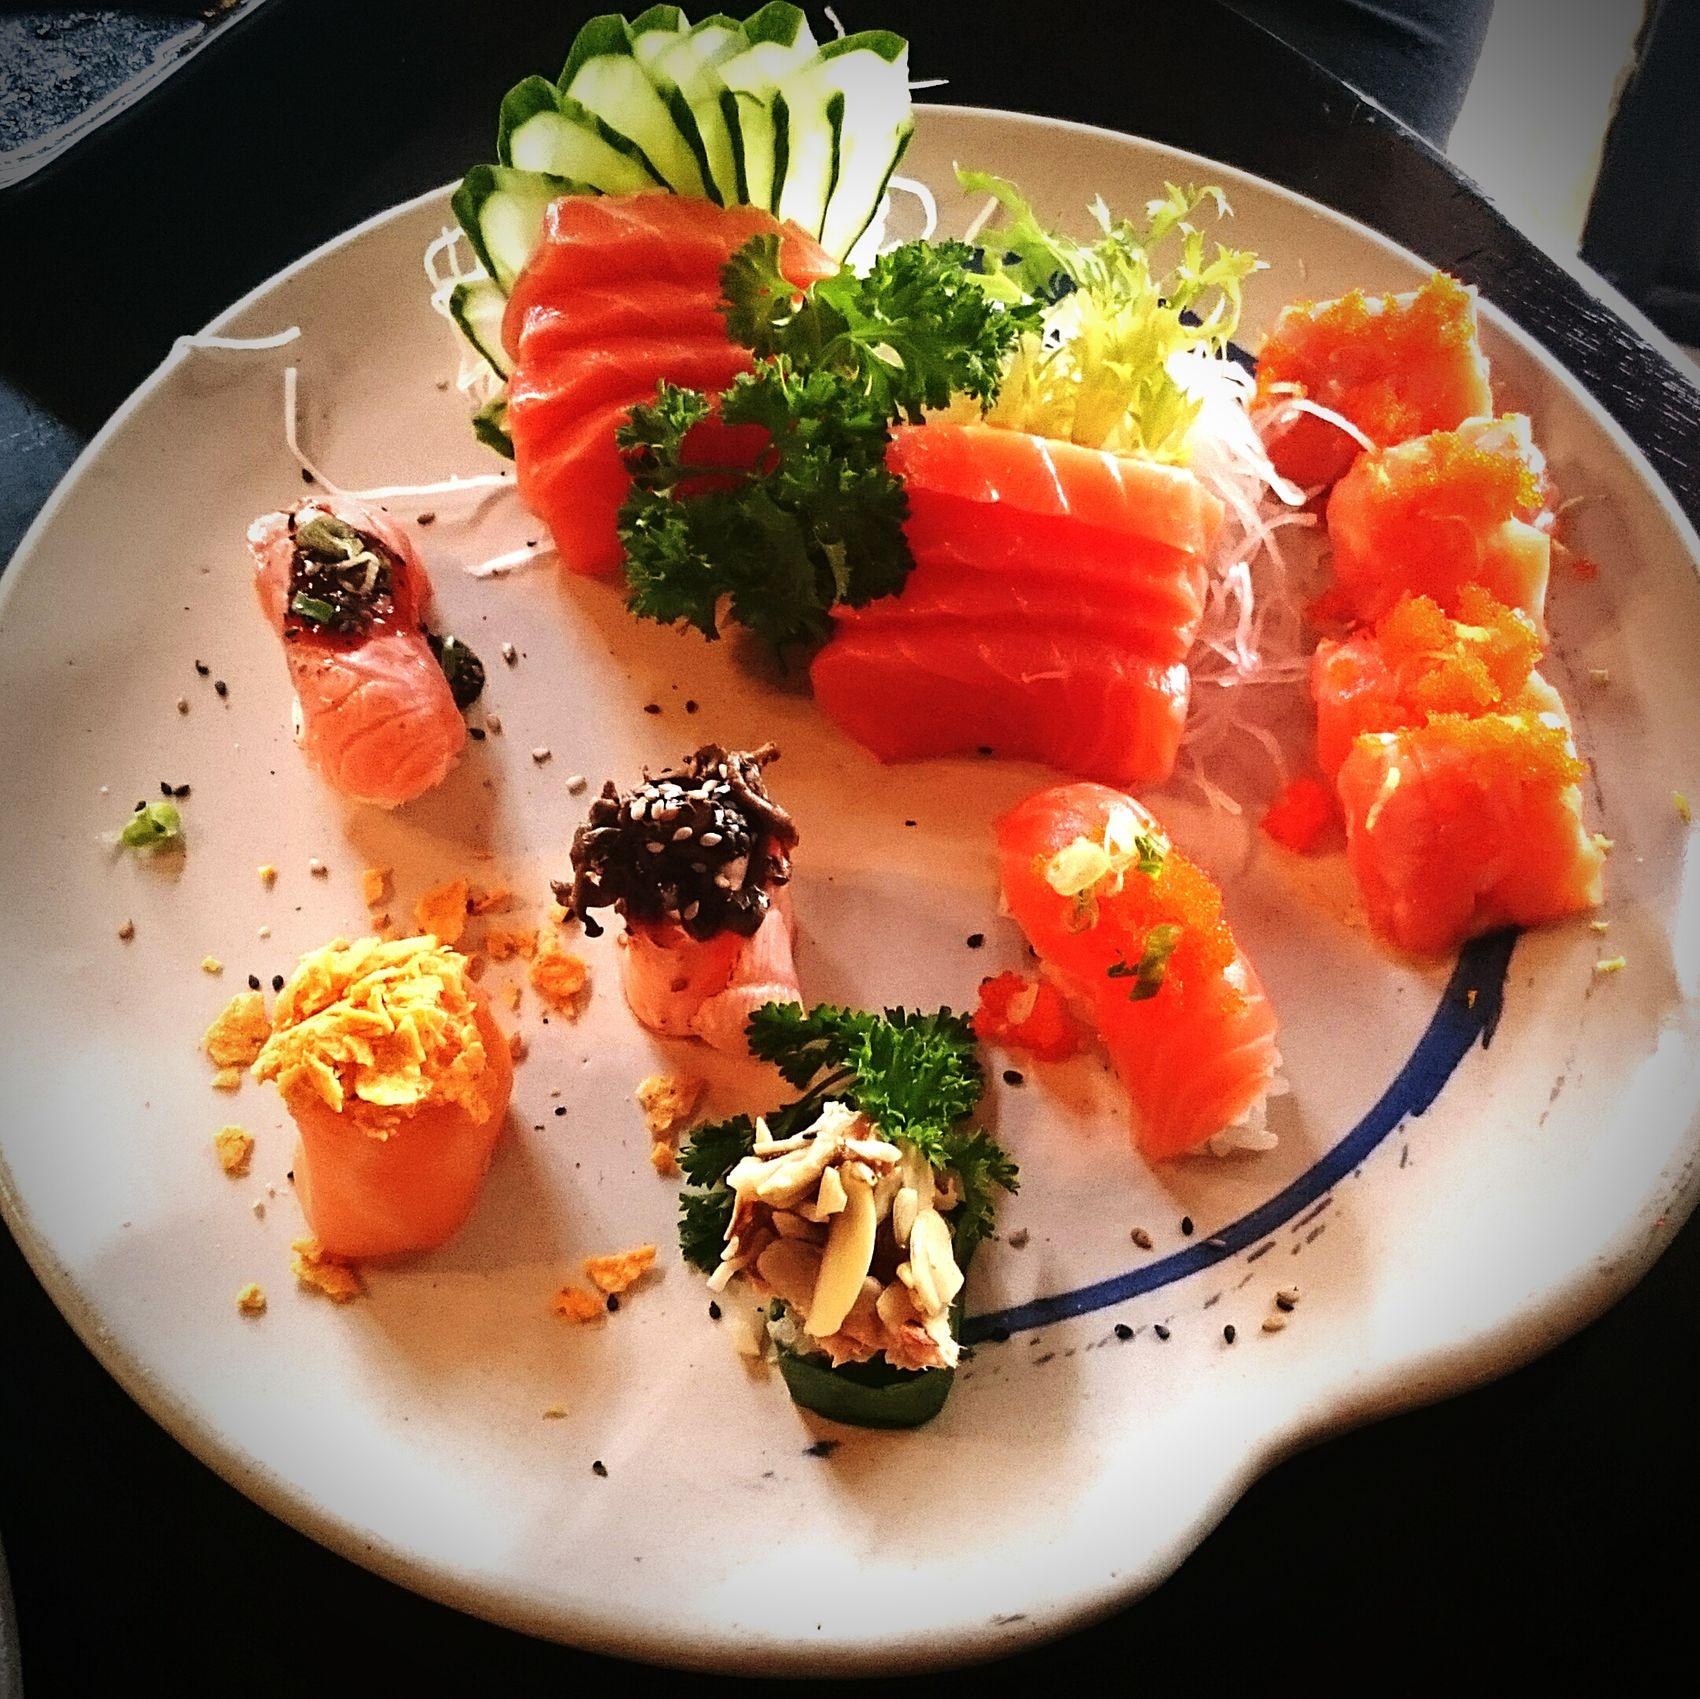 The Foodie - 2015 EyeEm Awards Salmon Sashimi Japanese Food